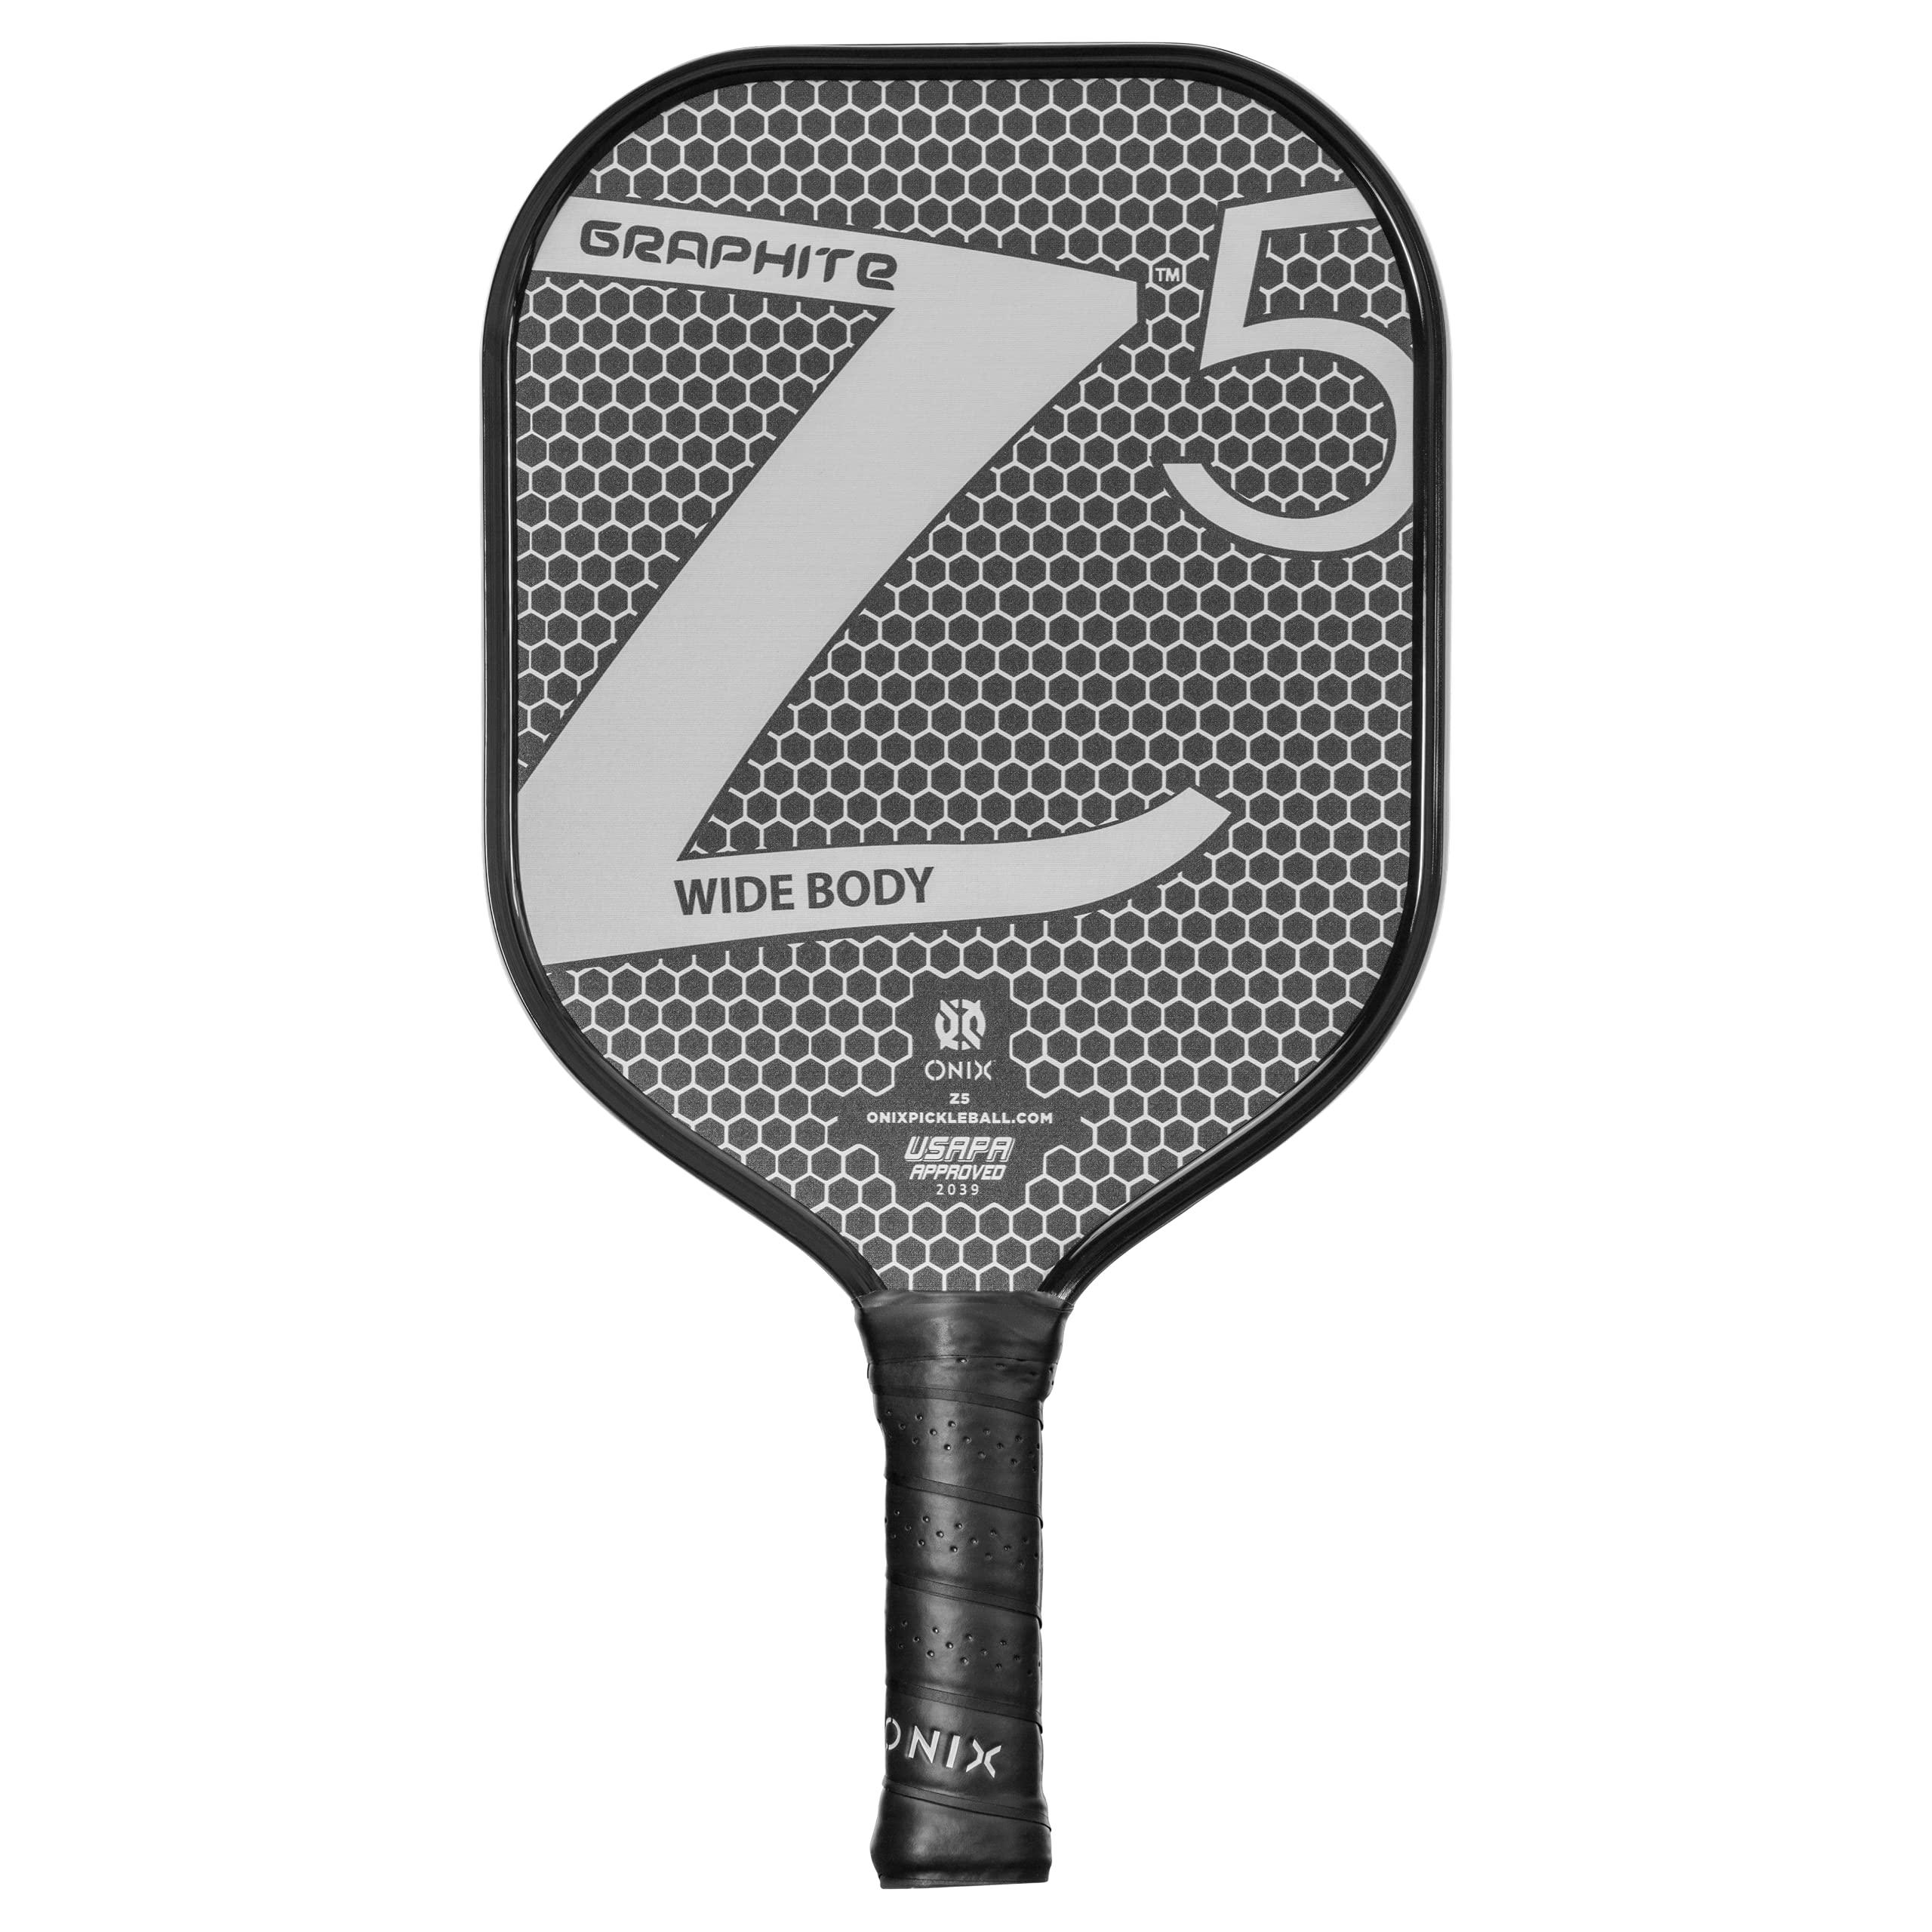 ONIX Graphite Z5 Graphite Carbon Fiber Pickleball Padd -ODQS